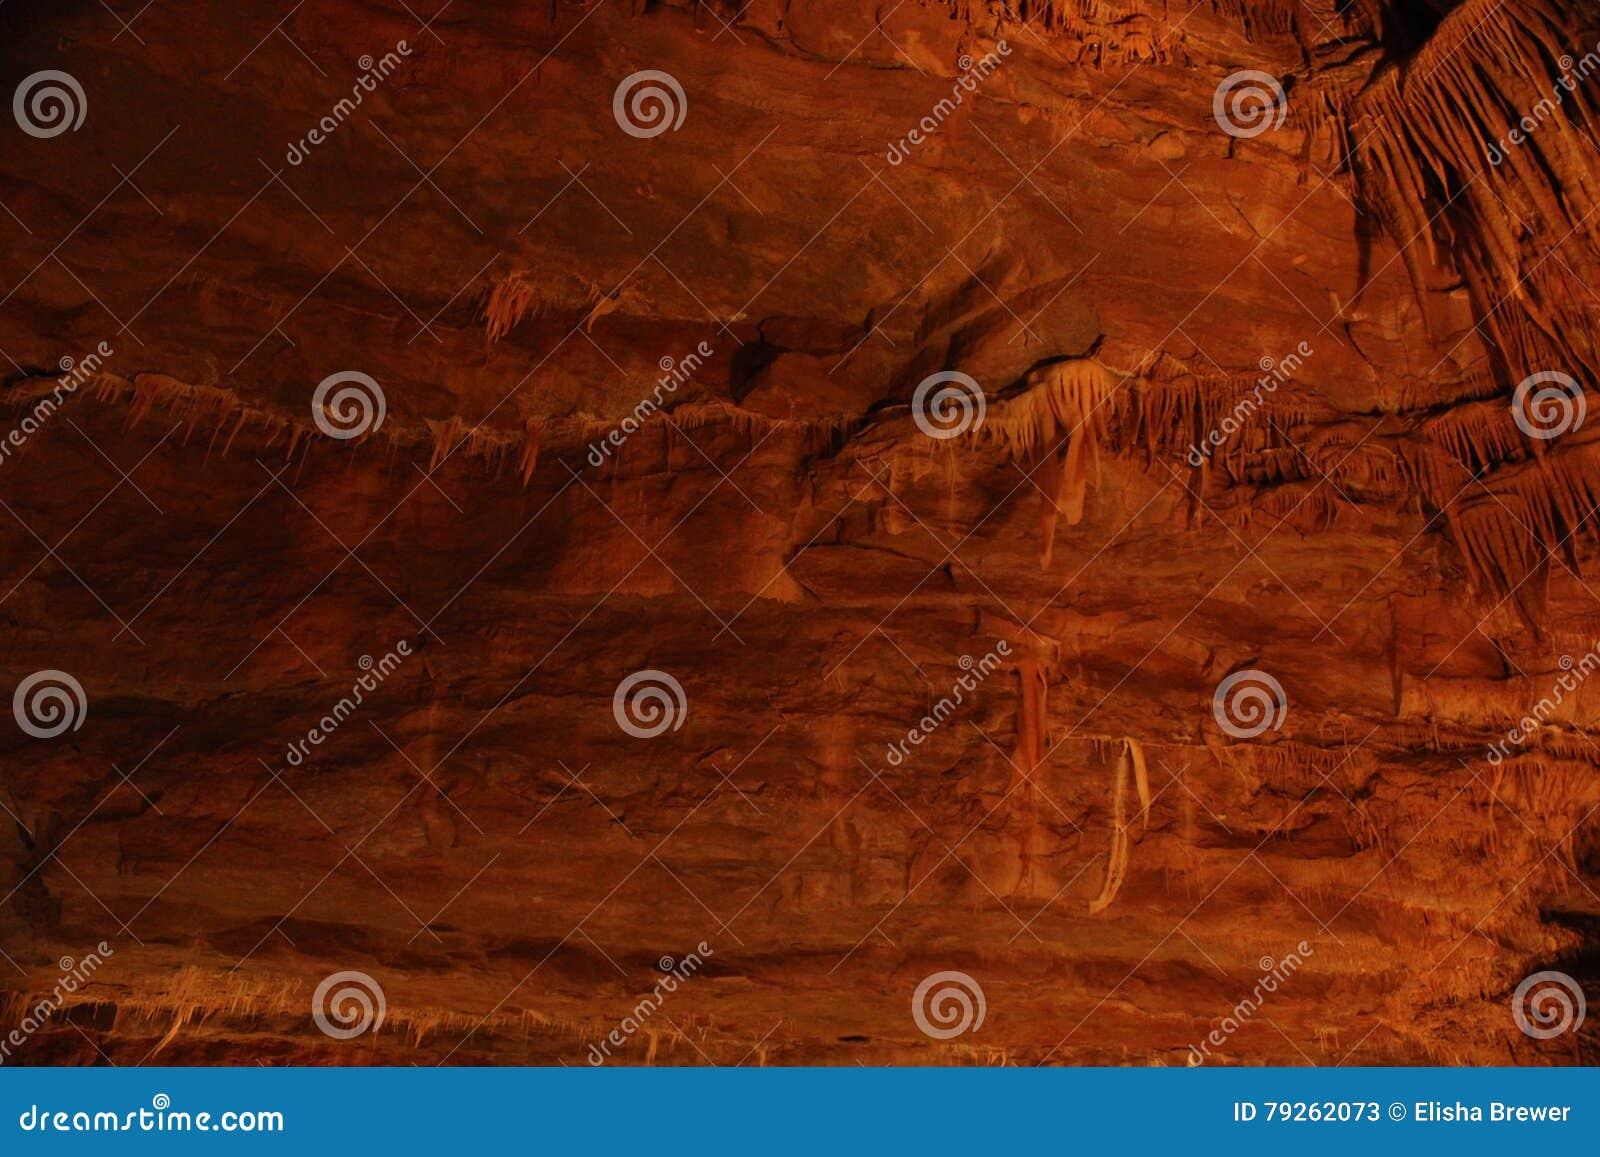 Mystic Caverns - Stalactites and Stalagmites - 8